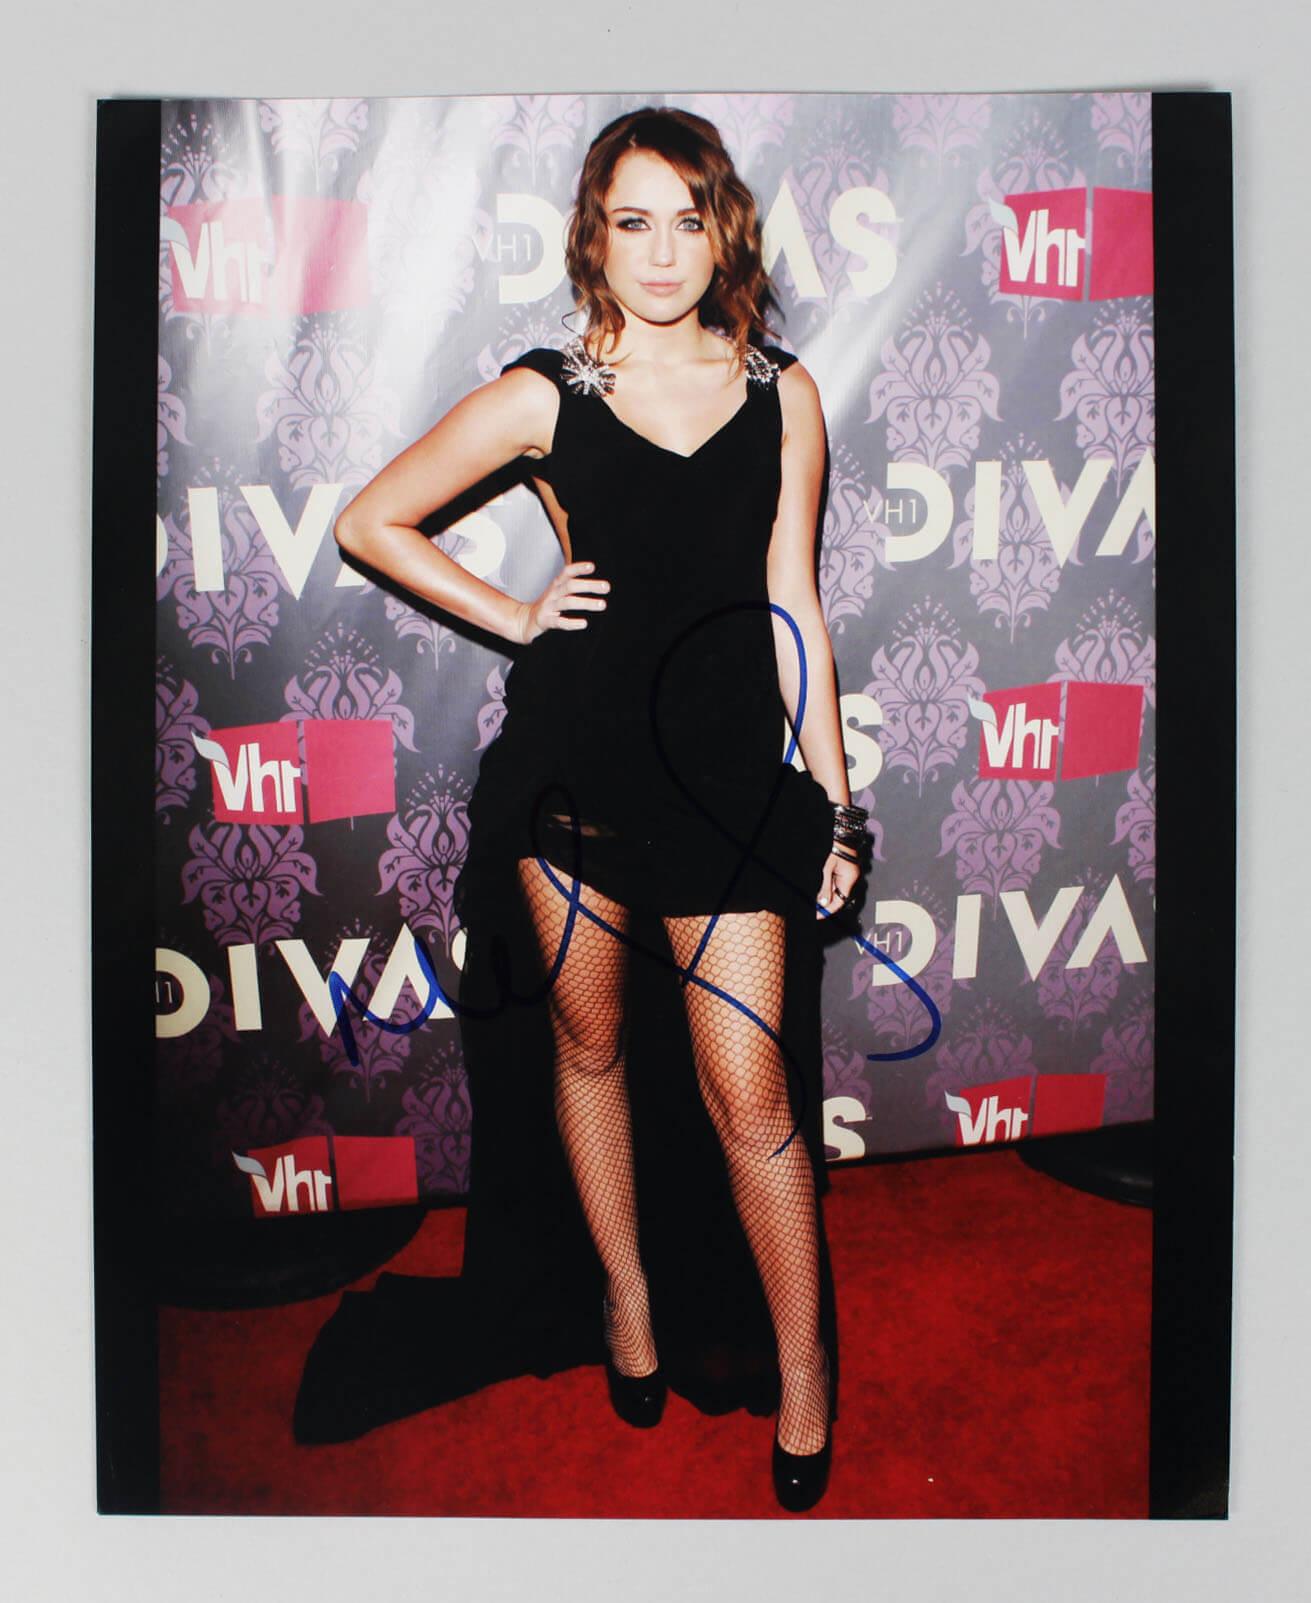 Singer Hannah Montana Miley Cyrus Signed Autographed 8×10 Photo (COA JSA)60047_01